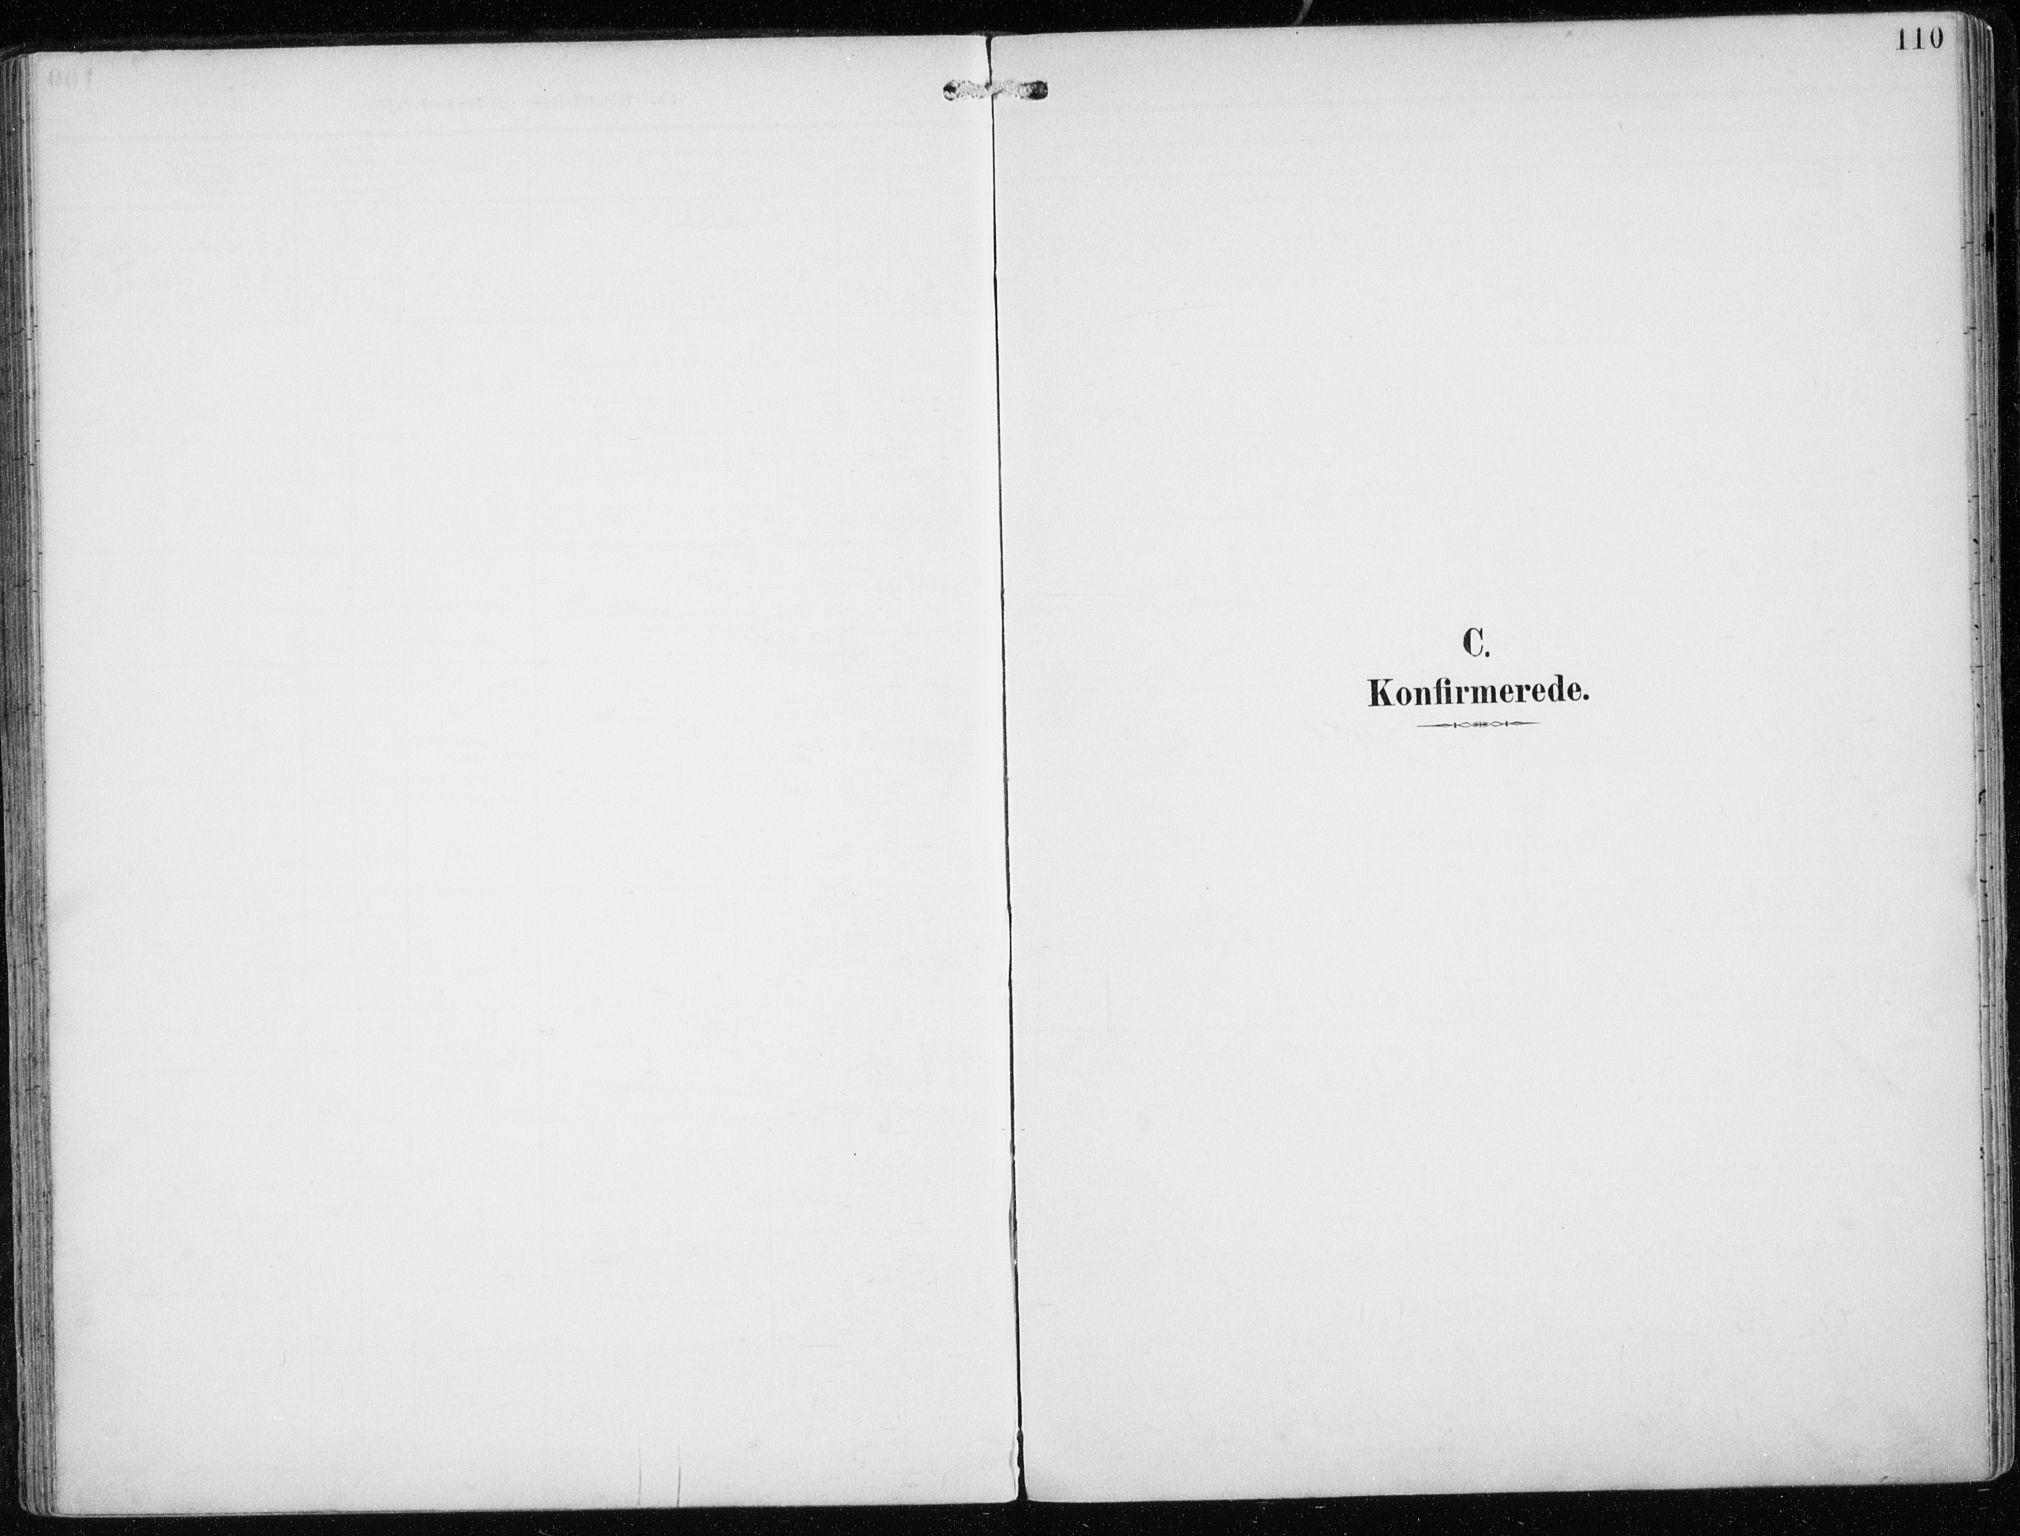 SATØ, Skjervøy sokneprestkontor, H/Ha/Haa/L0016kirke: Ministerialbok nr. 16, 1892-1908, s. 110